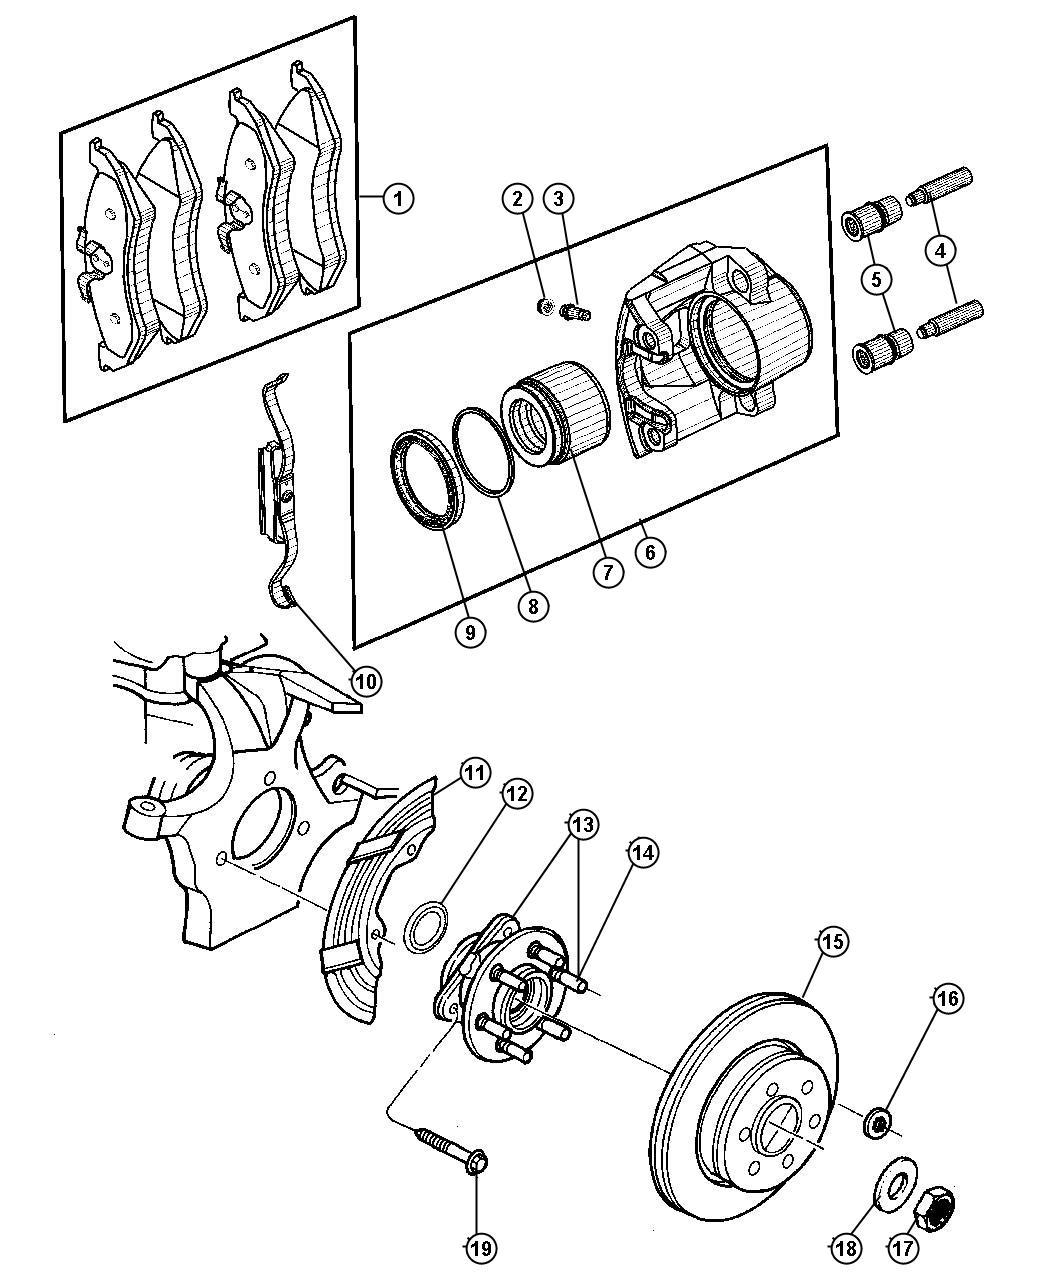 96 Dakota Fuse Box Diagram